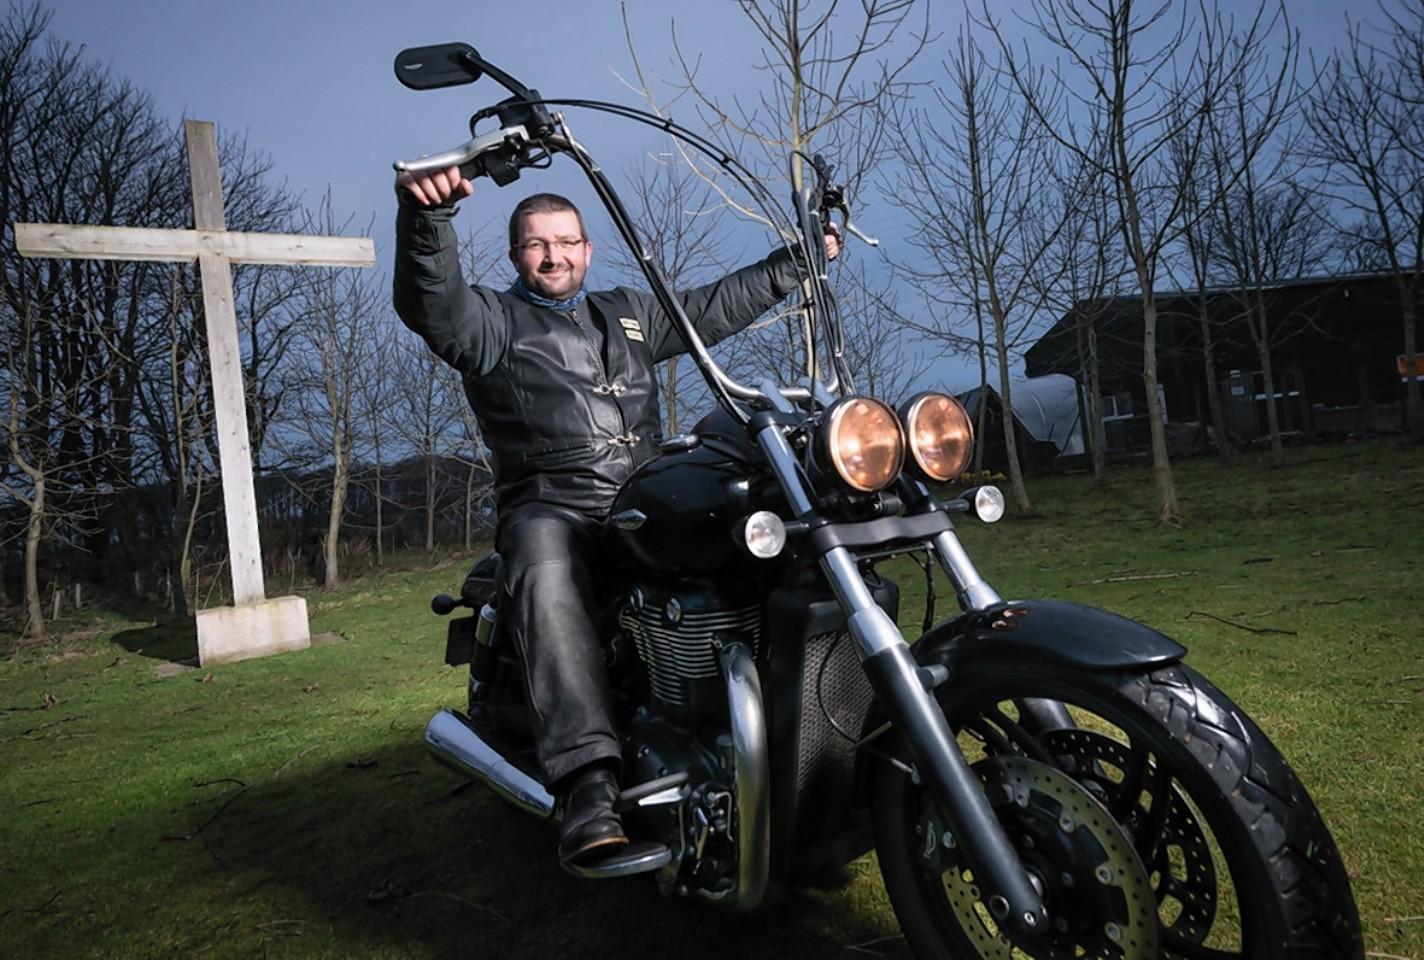 Gordon Cruden from Teen Challenge North East Scotland